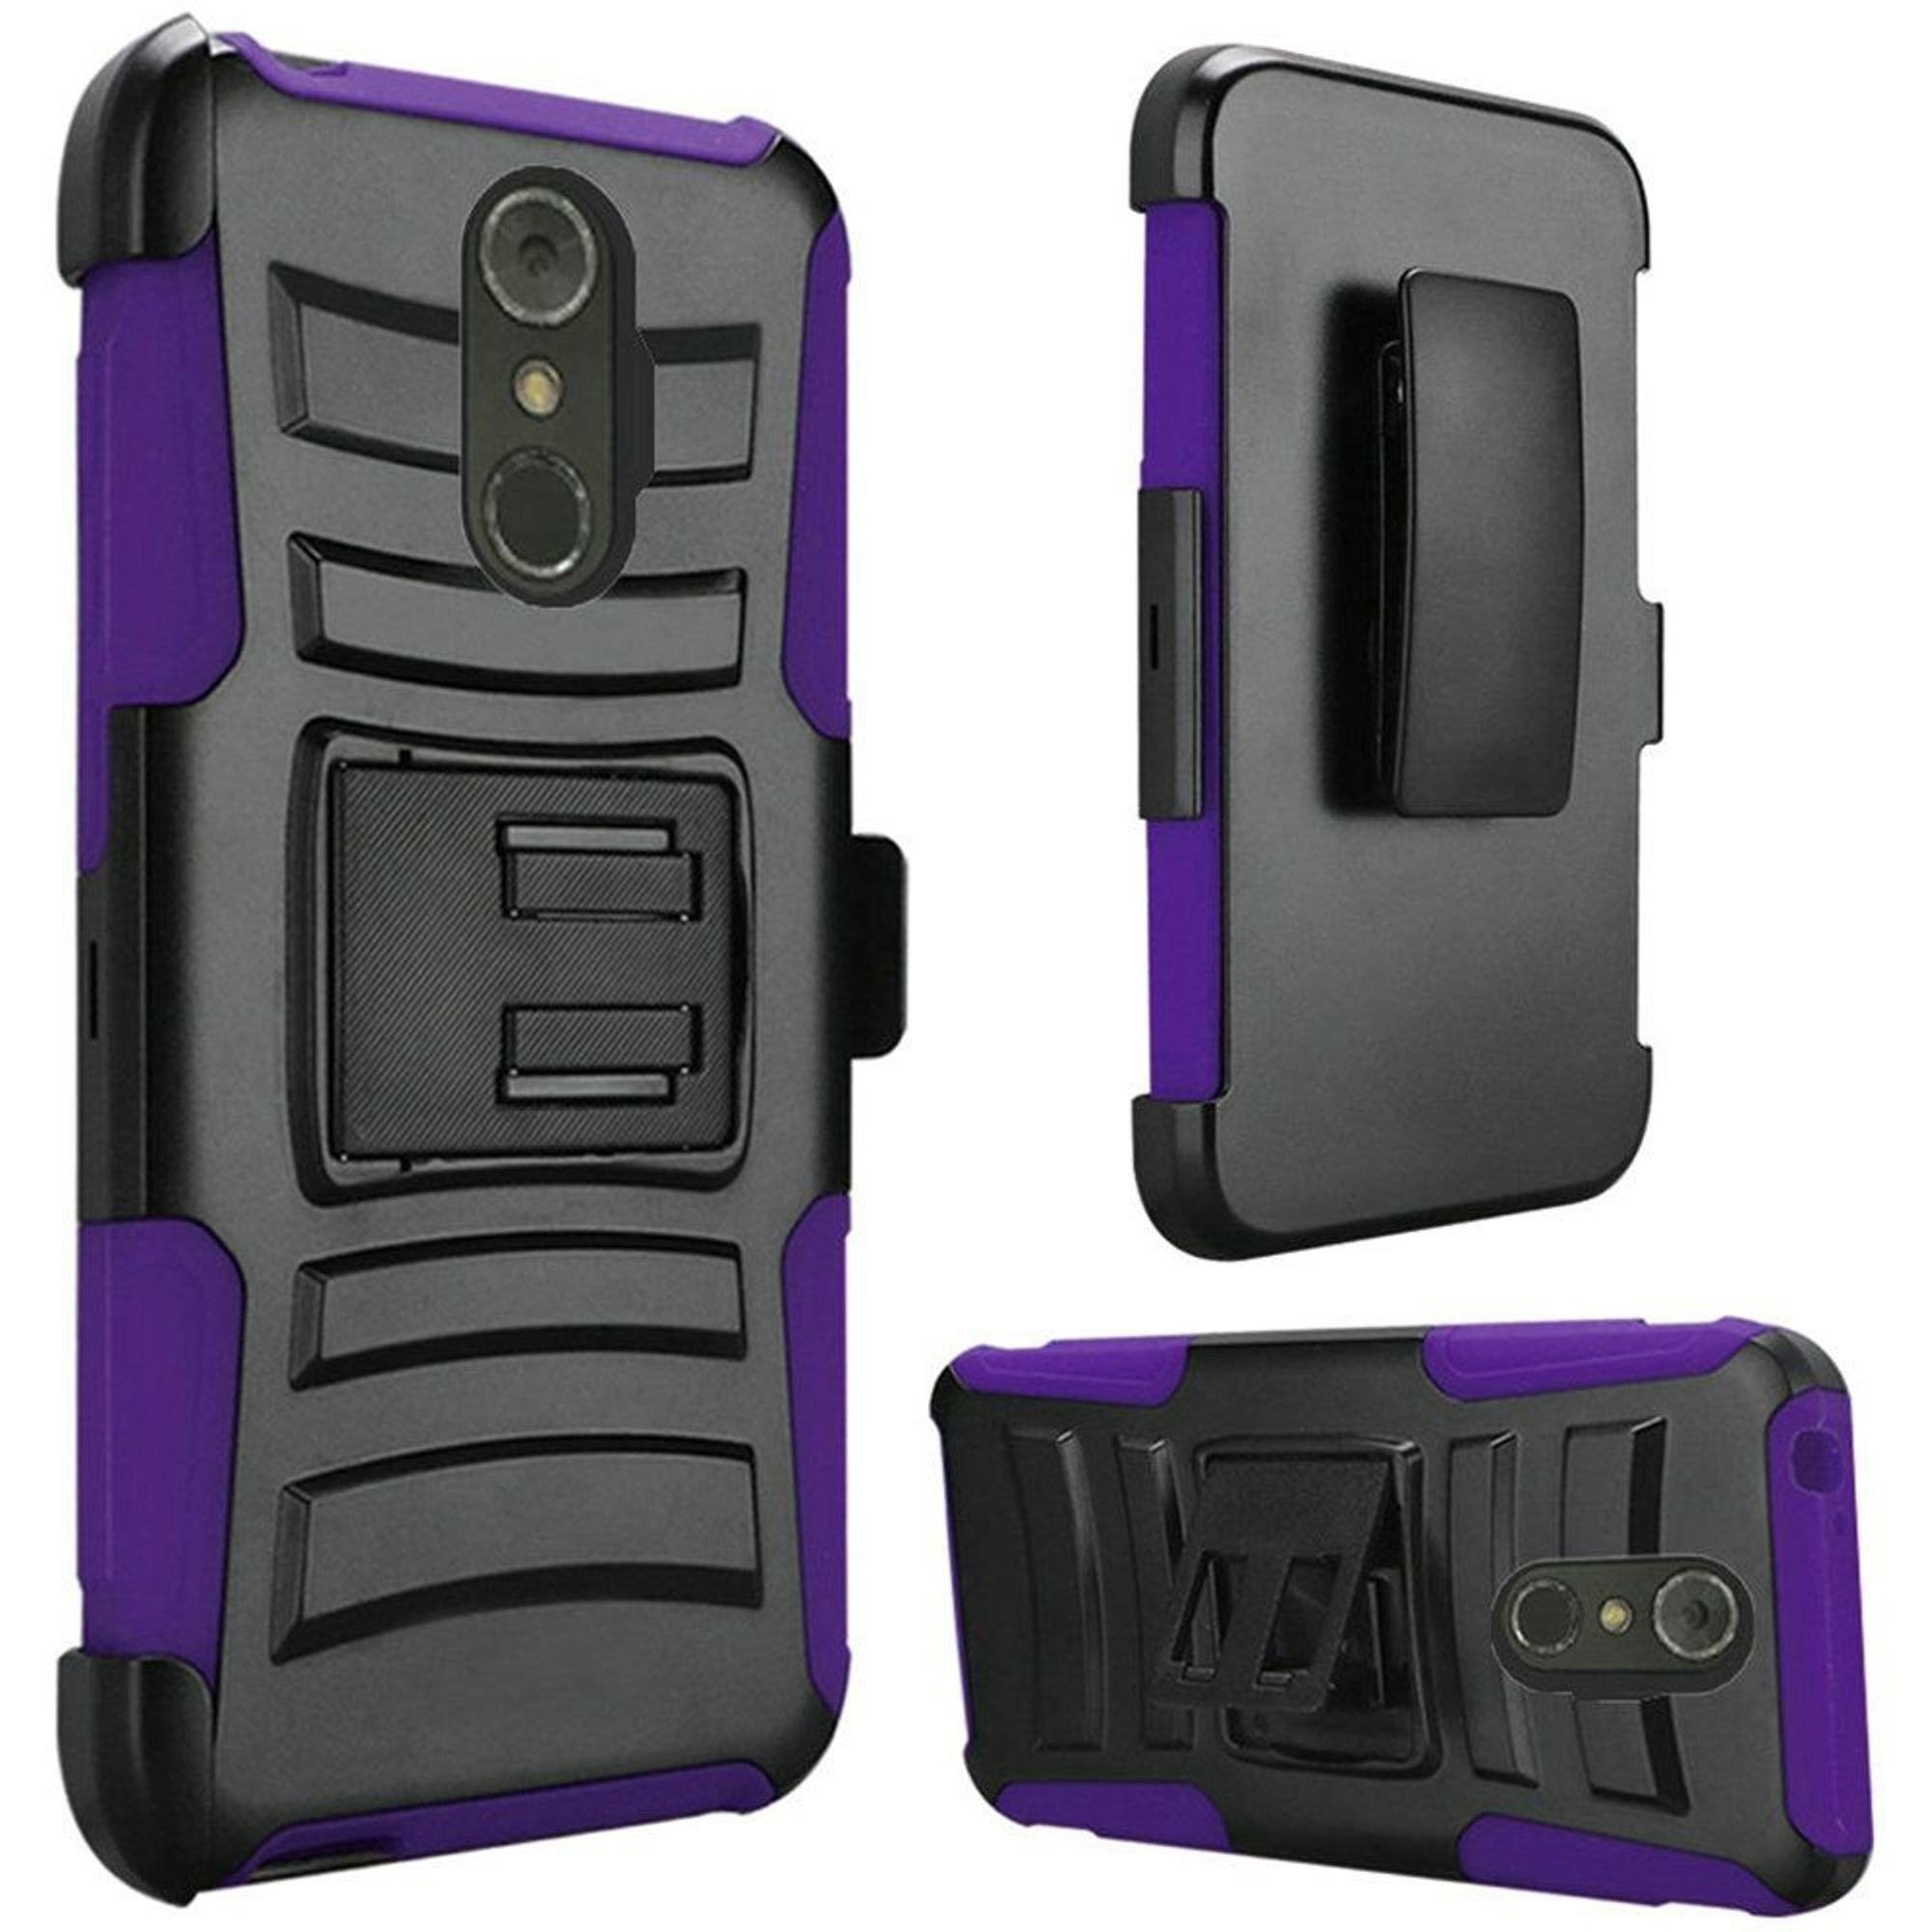 LG  Stylo 4 Stylo 4 plus Case, by HR Wireless Hard Hybrid Plastic Case w/stand/Holster For LG  Stylo 4 Stylo 4 plus - Black/Dark Purple